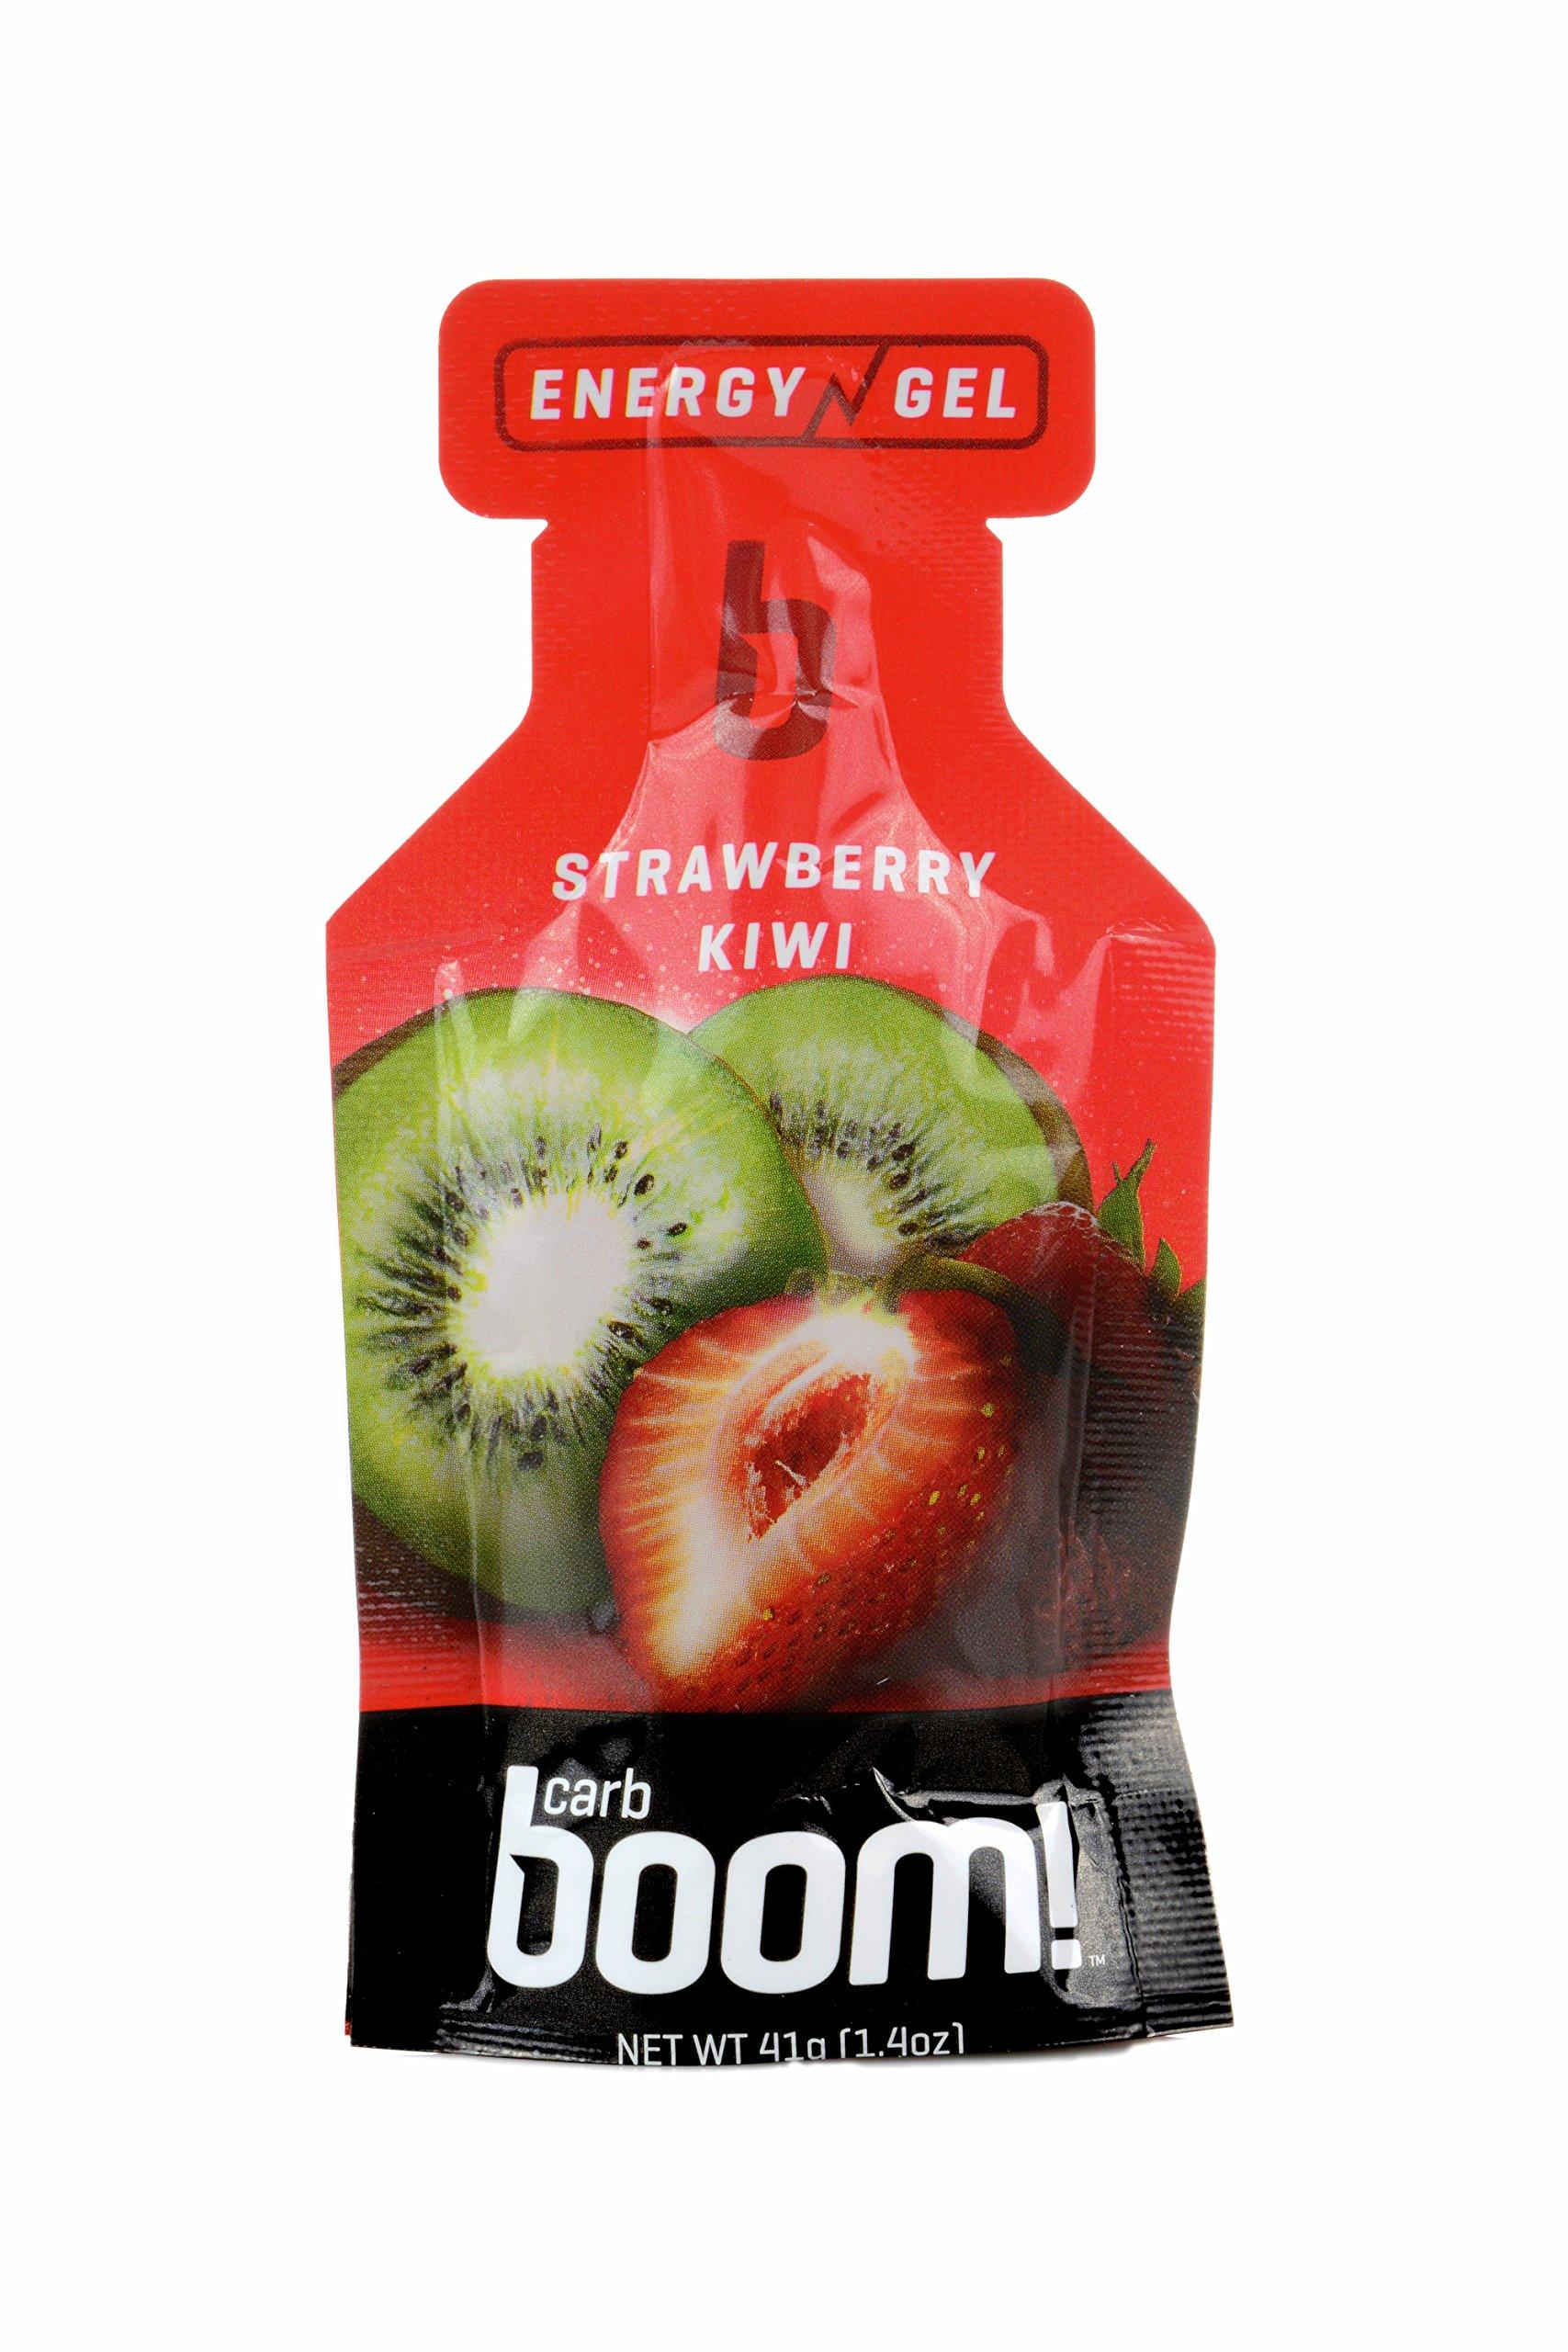 Carb Boom! Energy Gel (Strawberry Kiwi) - 24 pack